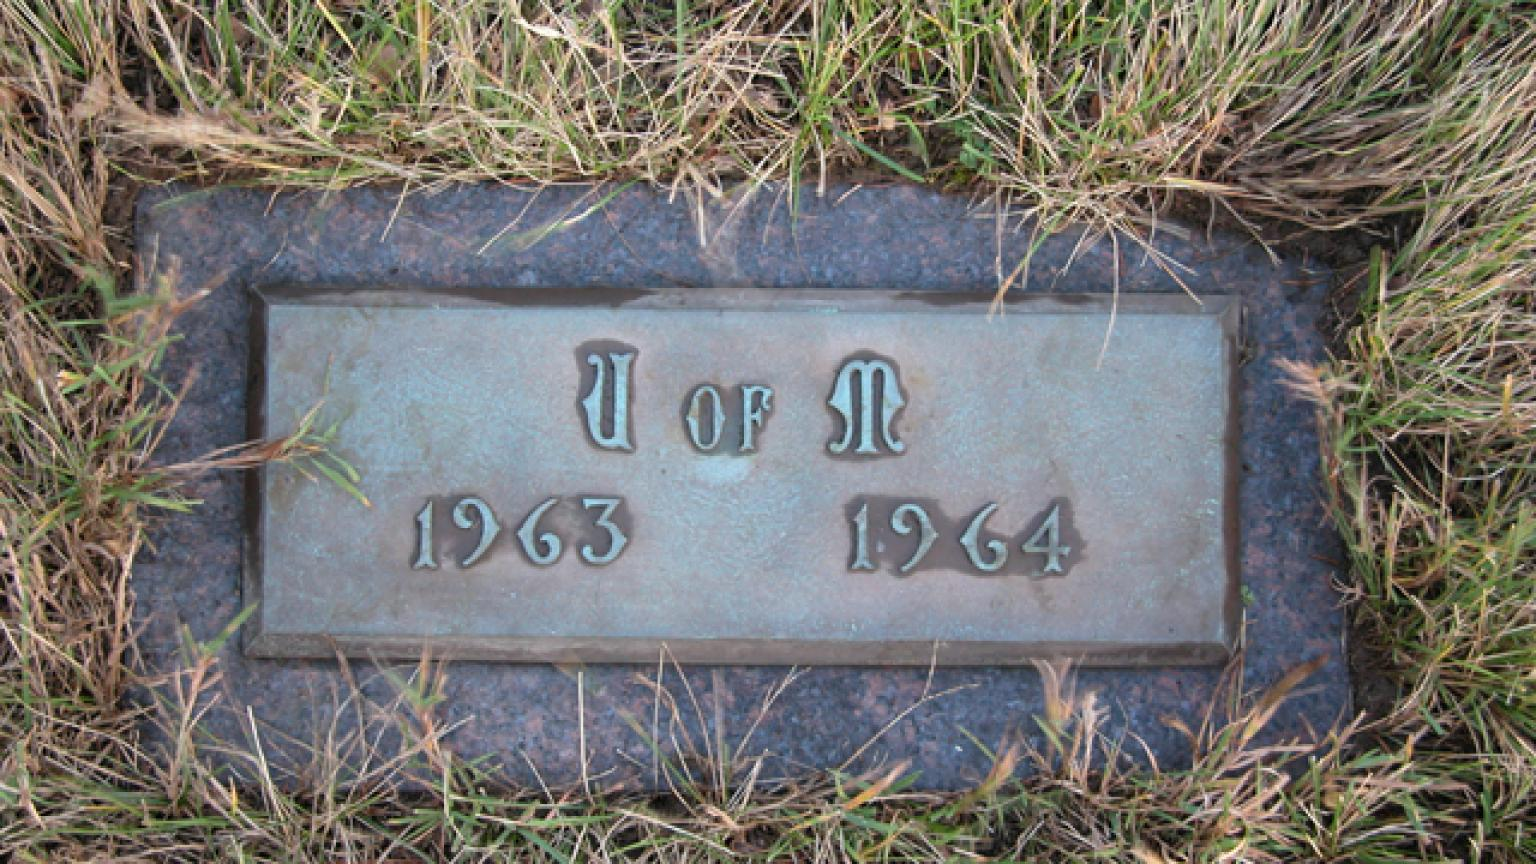 United Memorial Gardens U of M Gravestone 1963-64